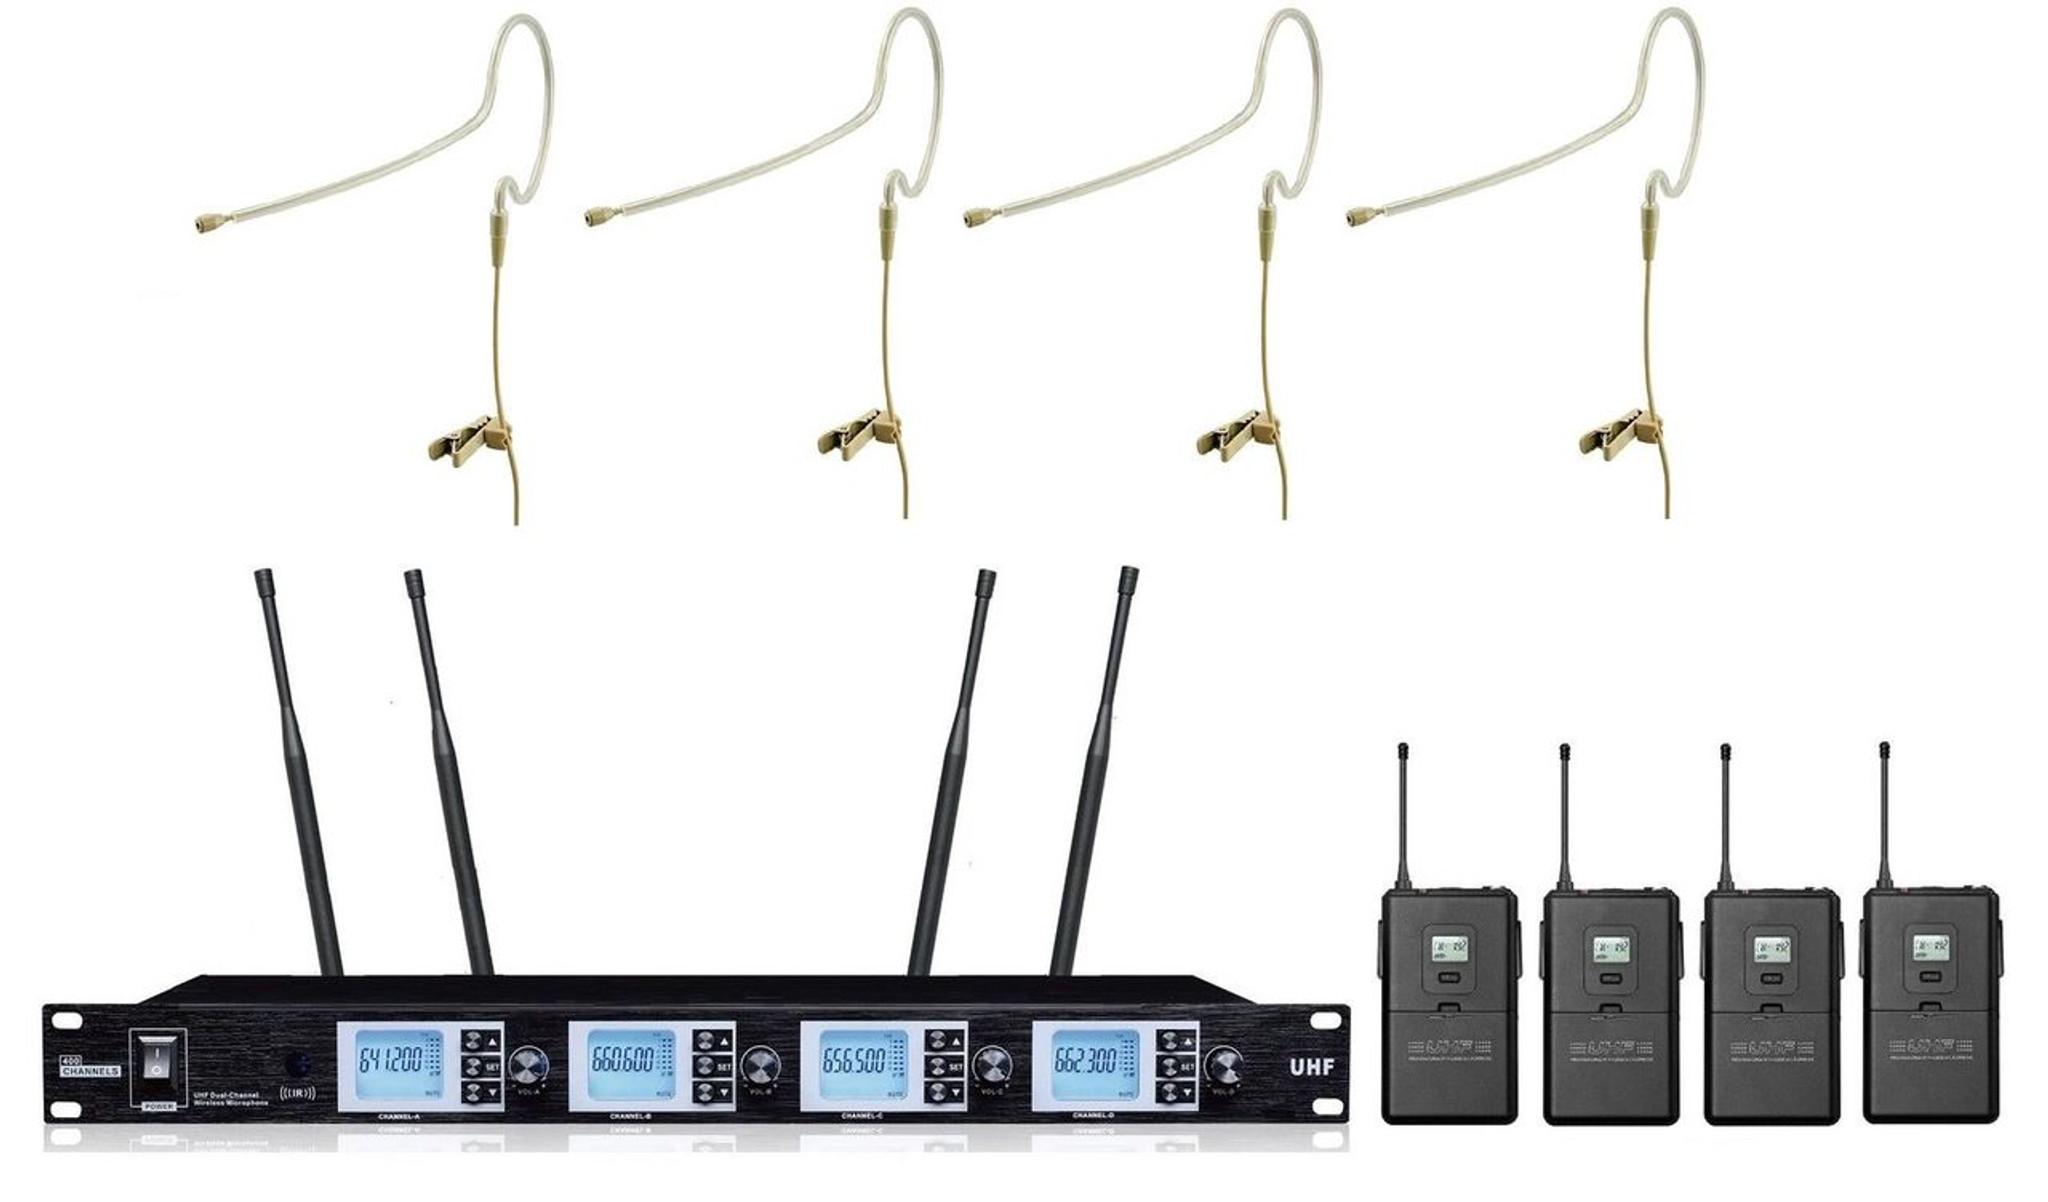 Bol Mic Pro Uhf Pr A4200sb 4 X 100 Channel Single Earhook